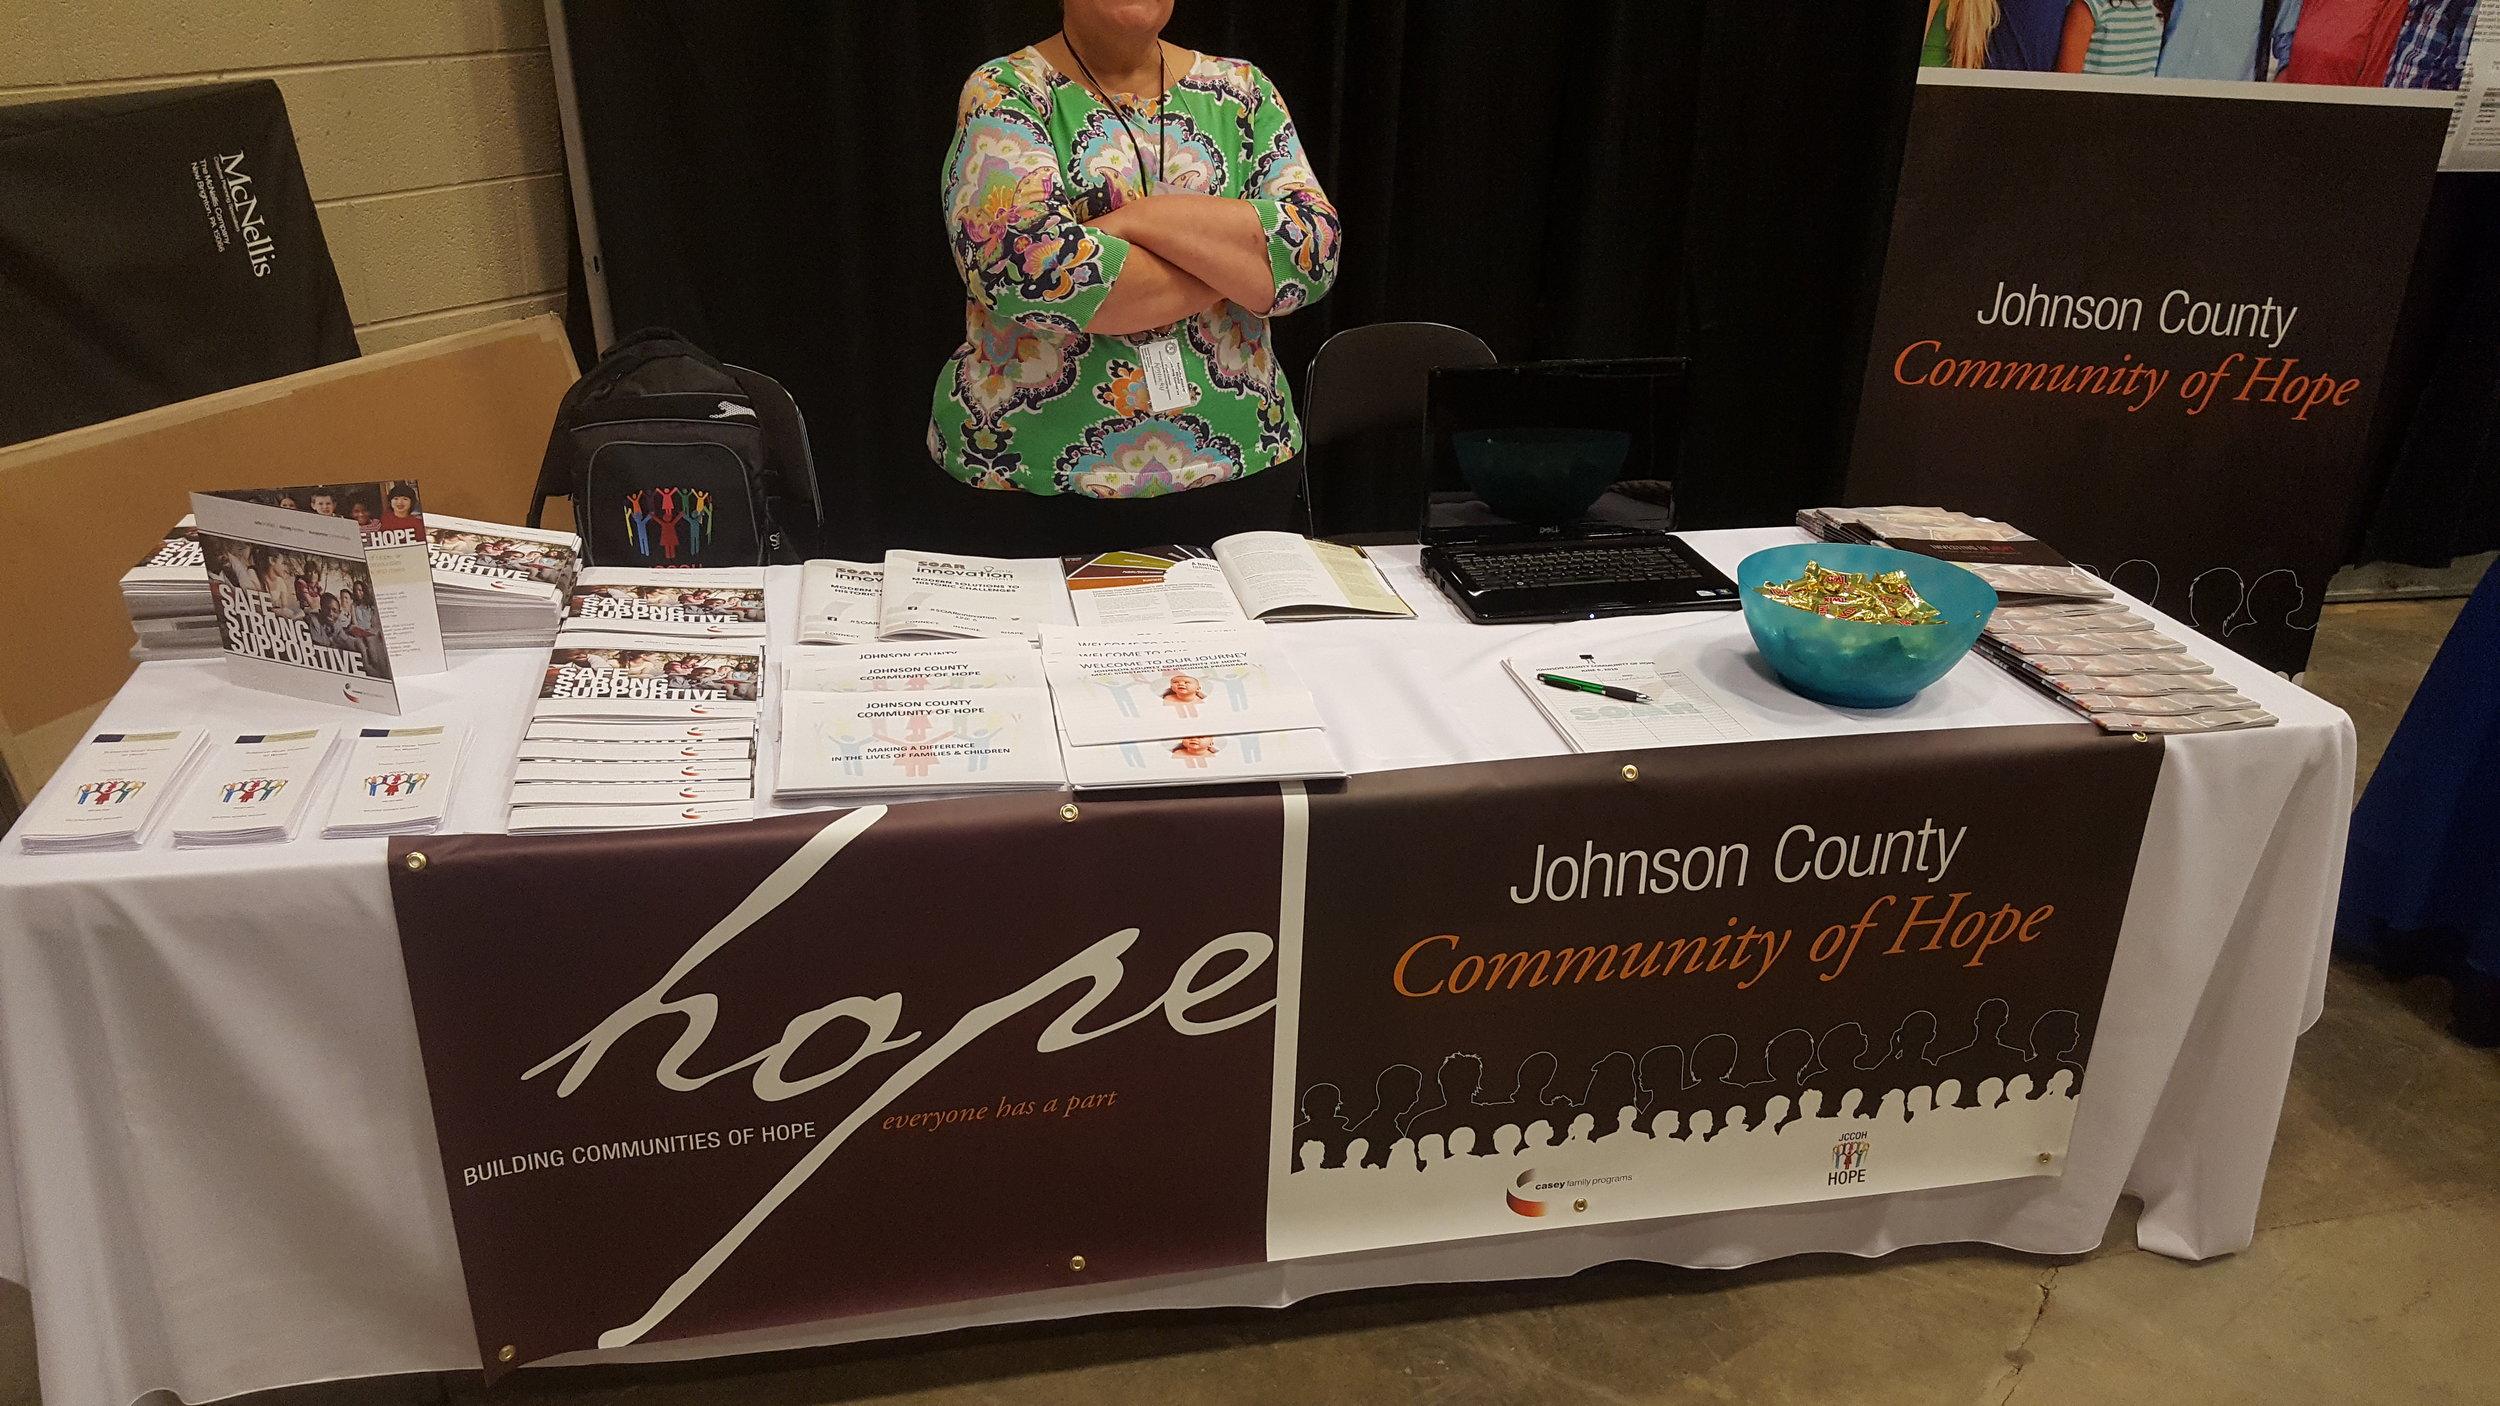 Hope - Johnson County Community of Hope.jpg